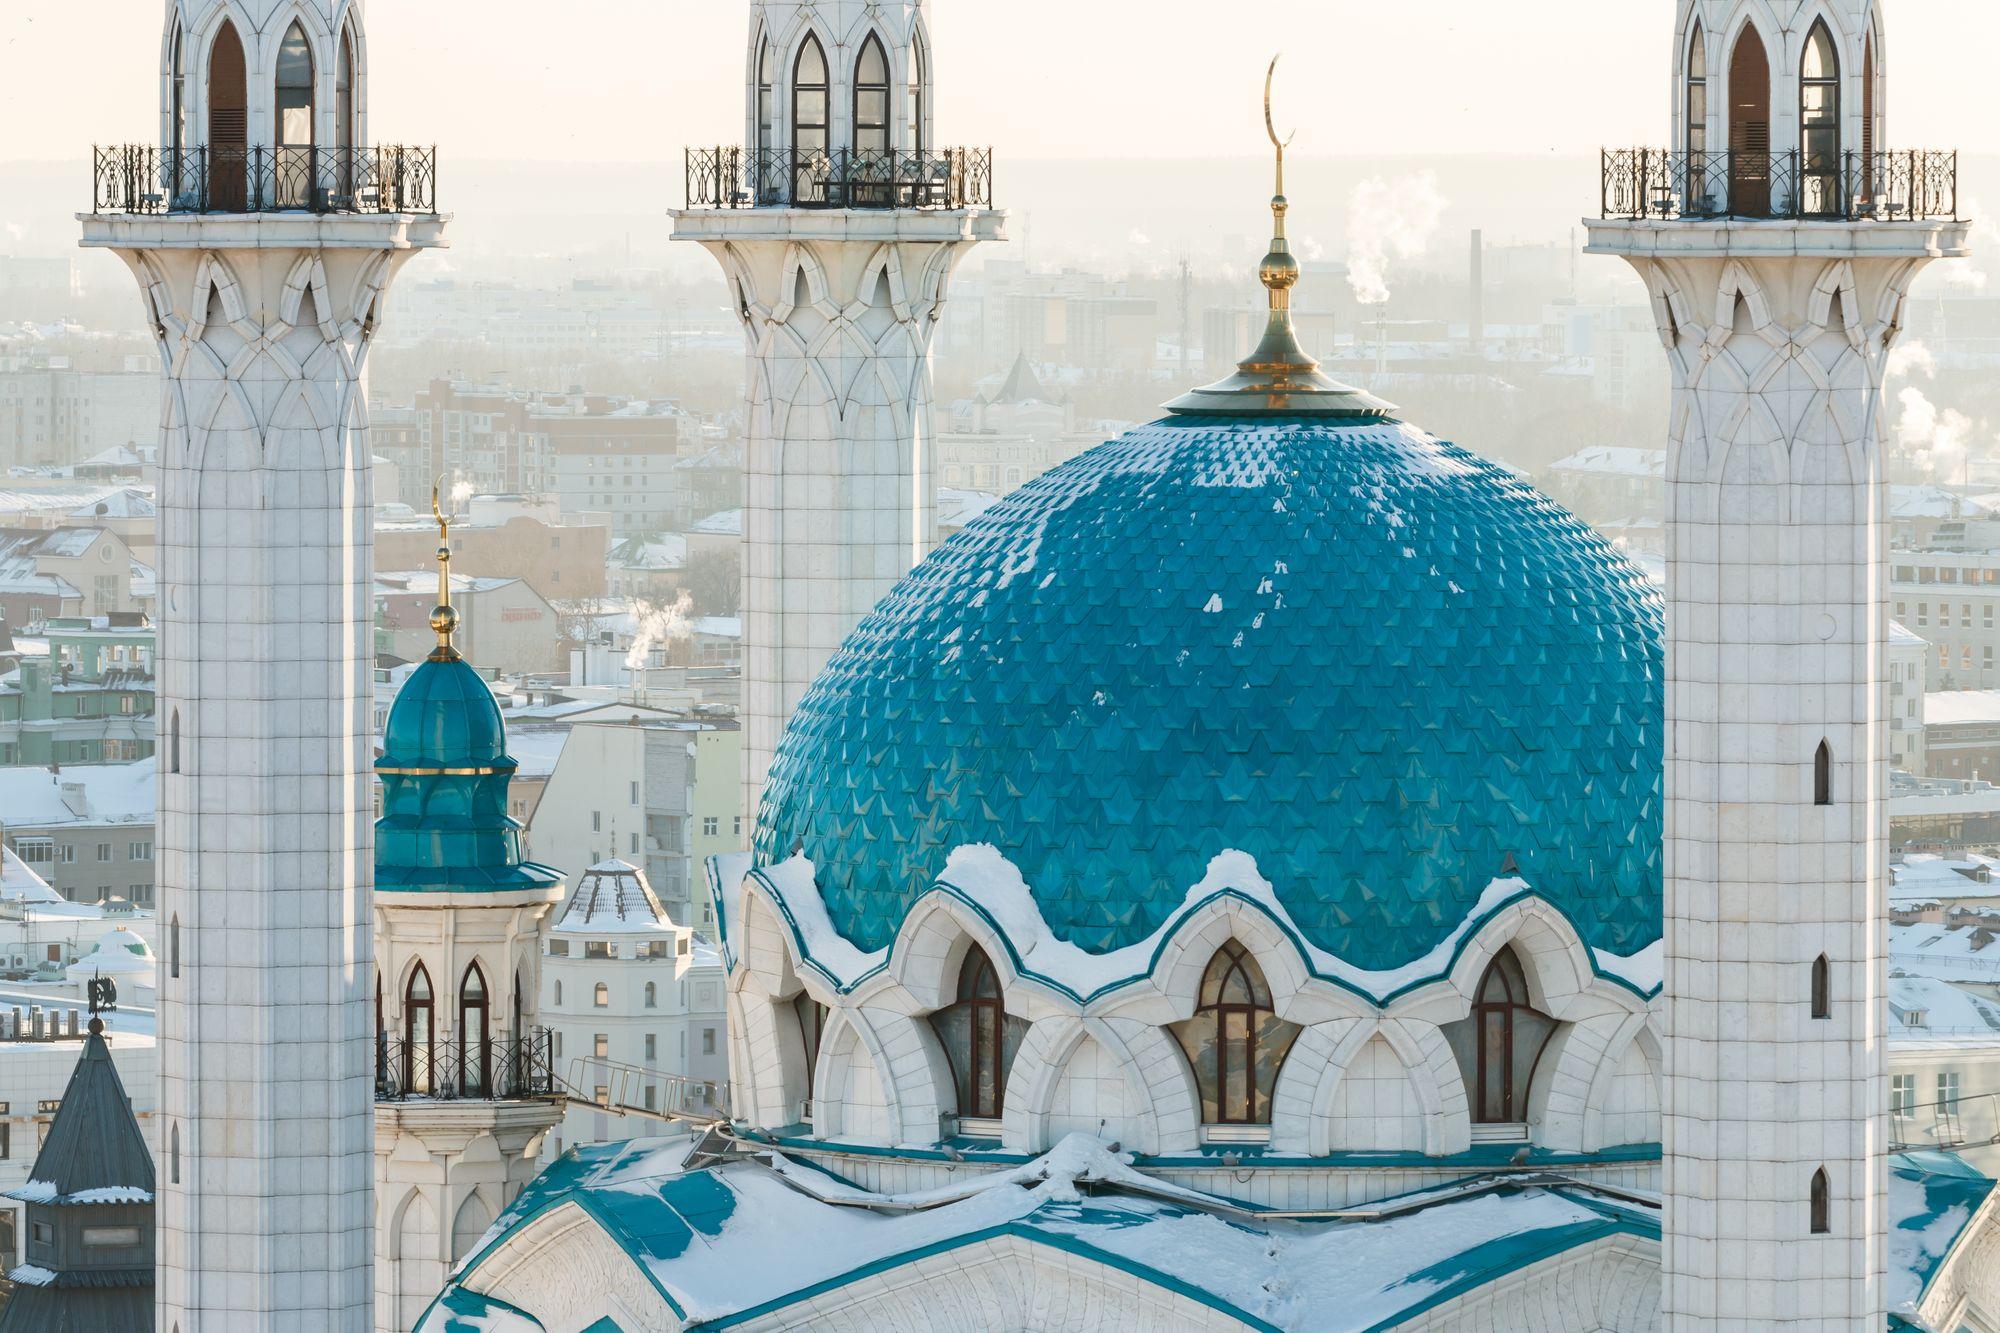 Kul Sharif mosque, Kazan city, Tatarstan, Russia